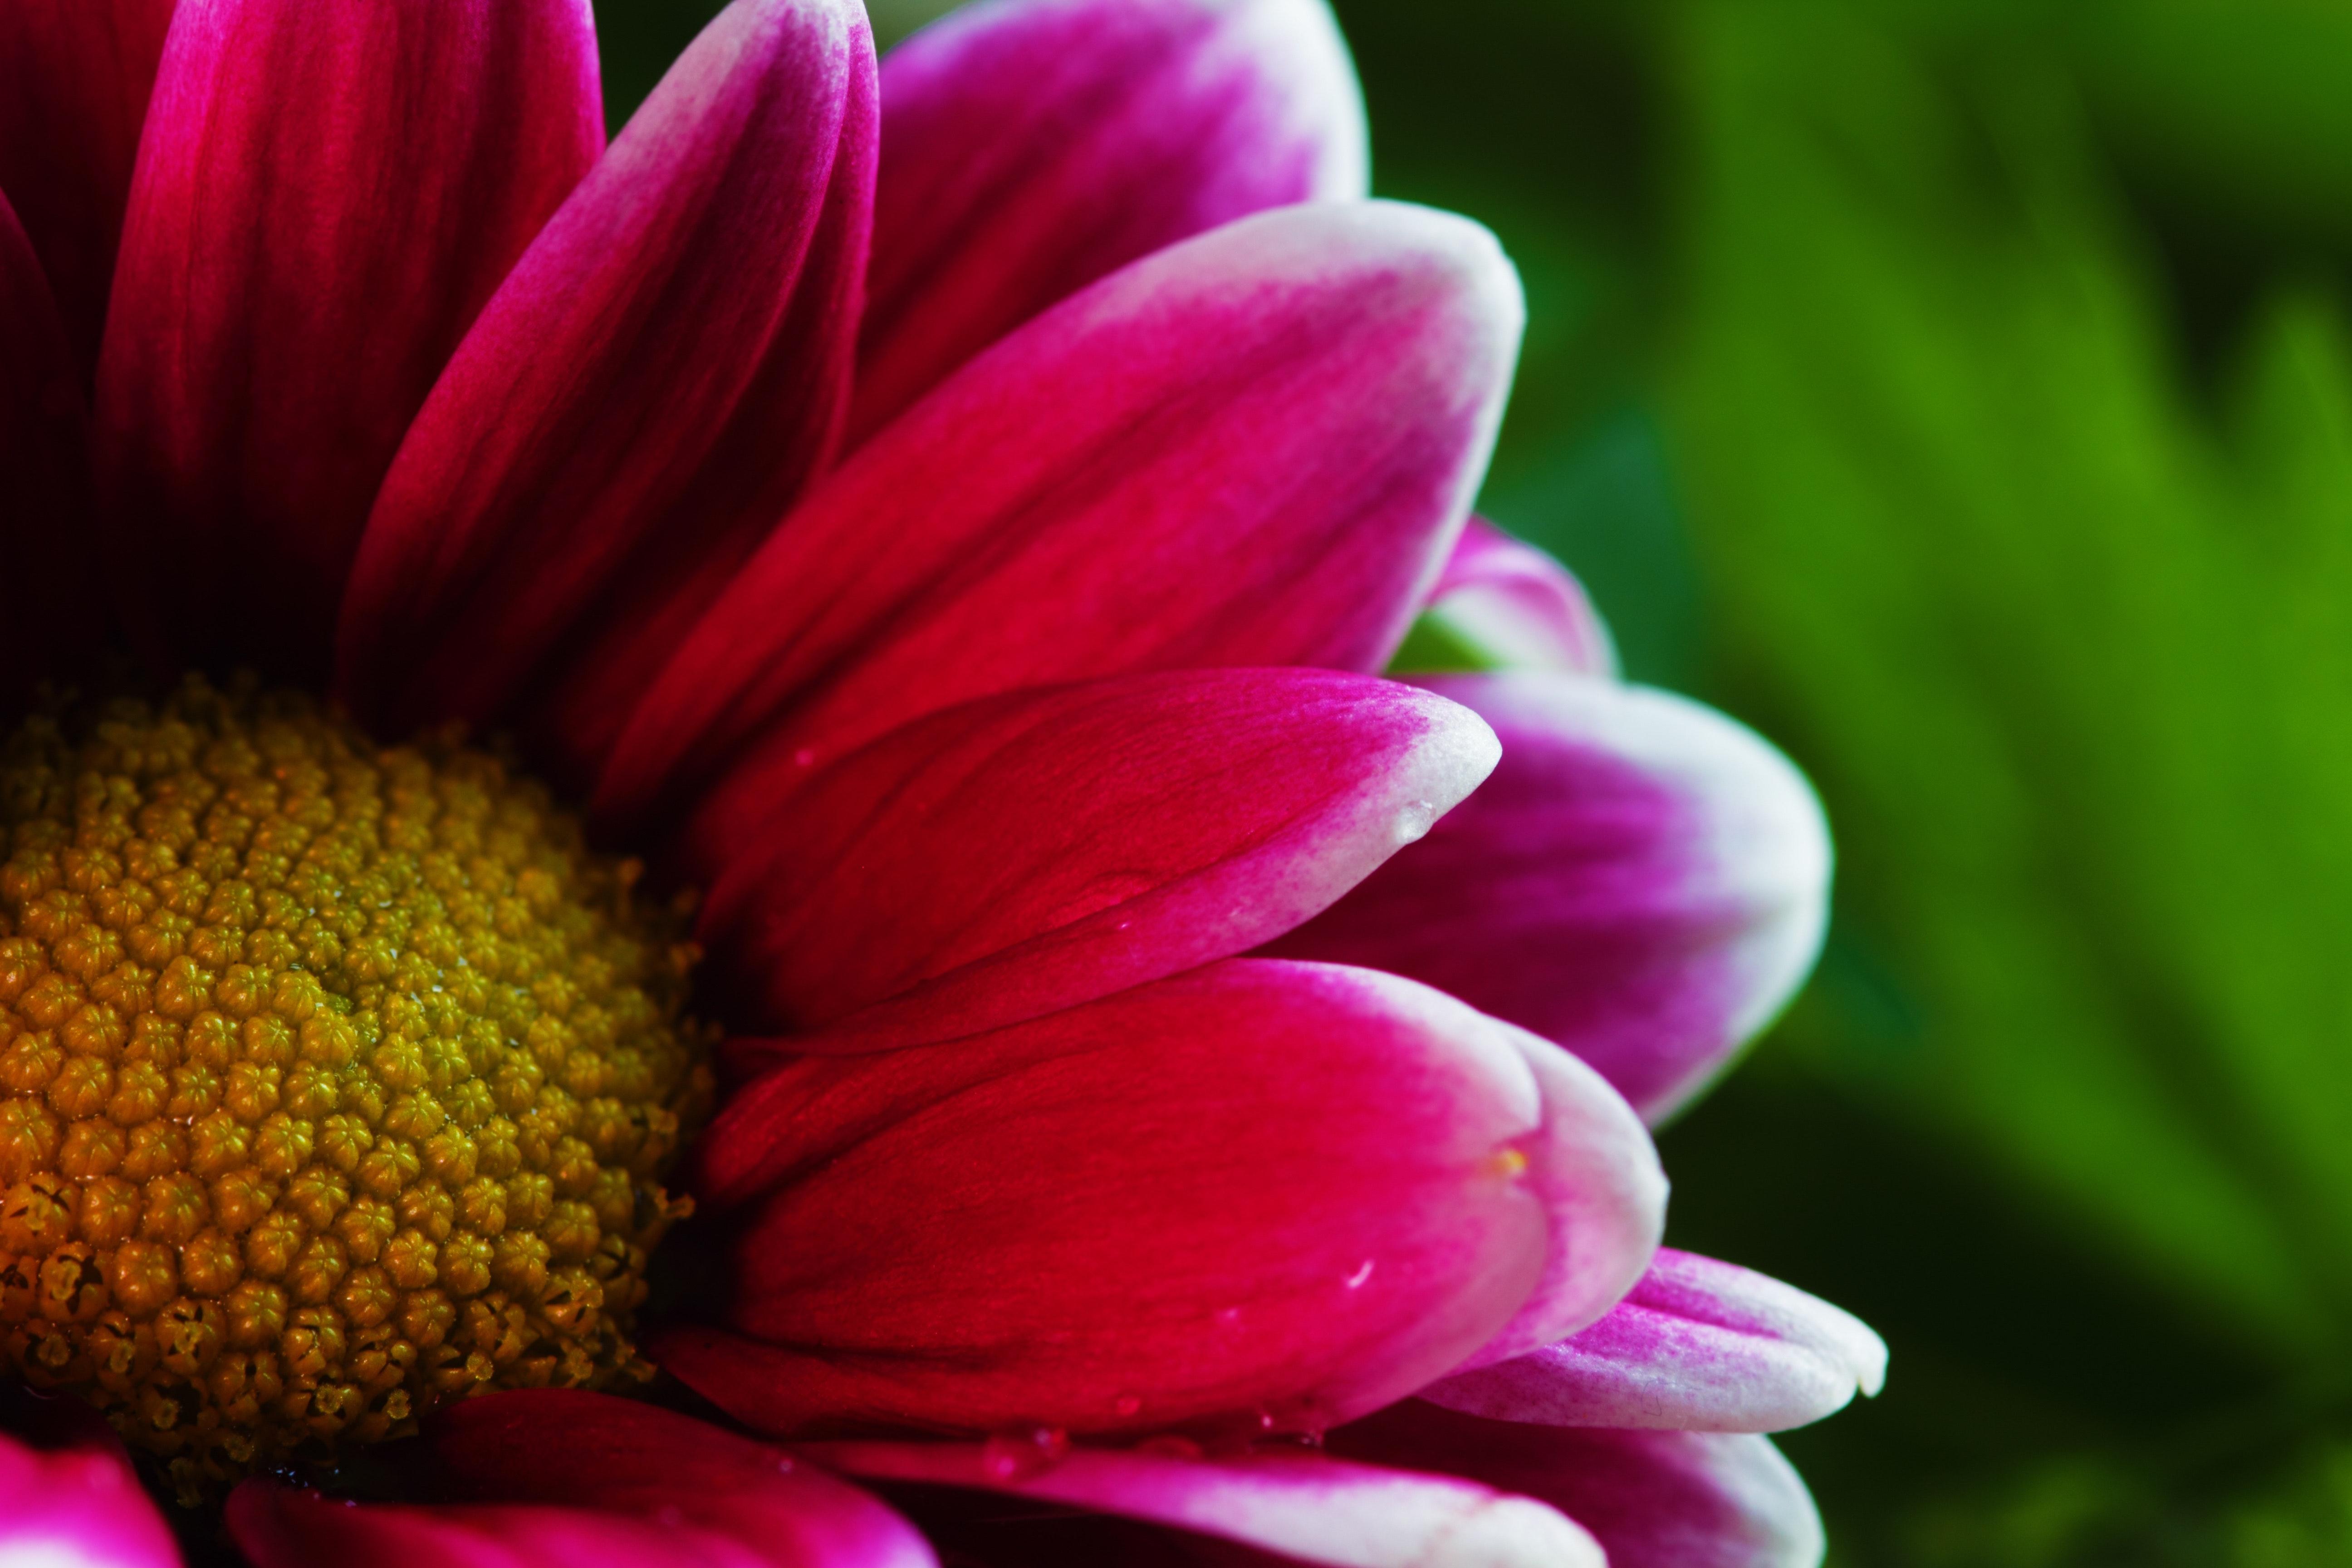 Pink Flower Photo, Beautiful, Flower, Vivid, Summer, HQ Photo